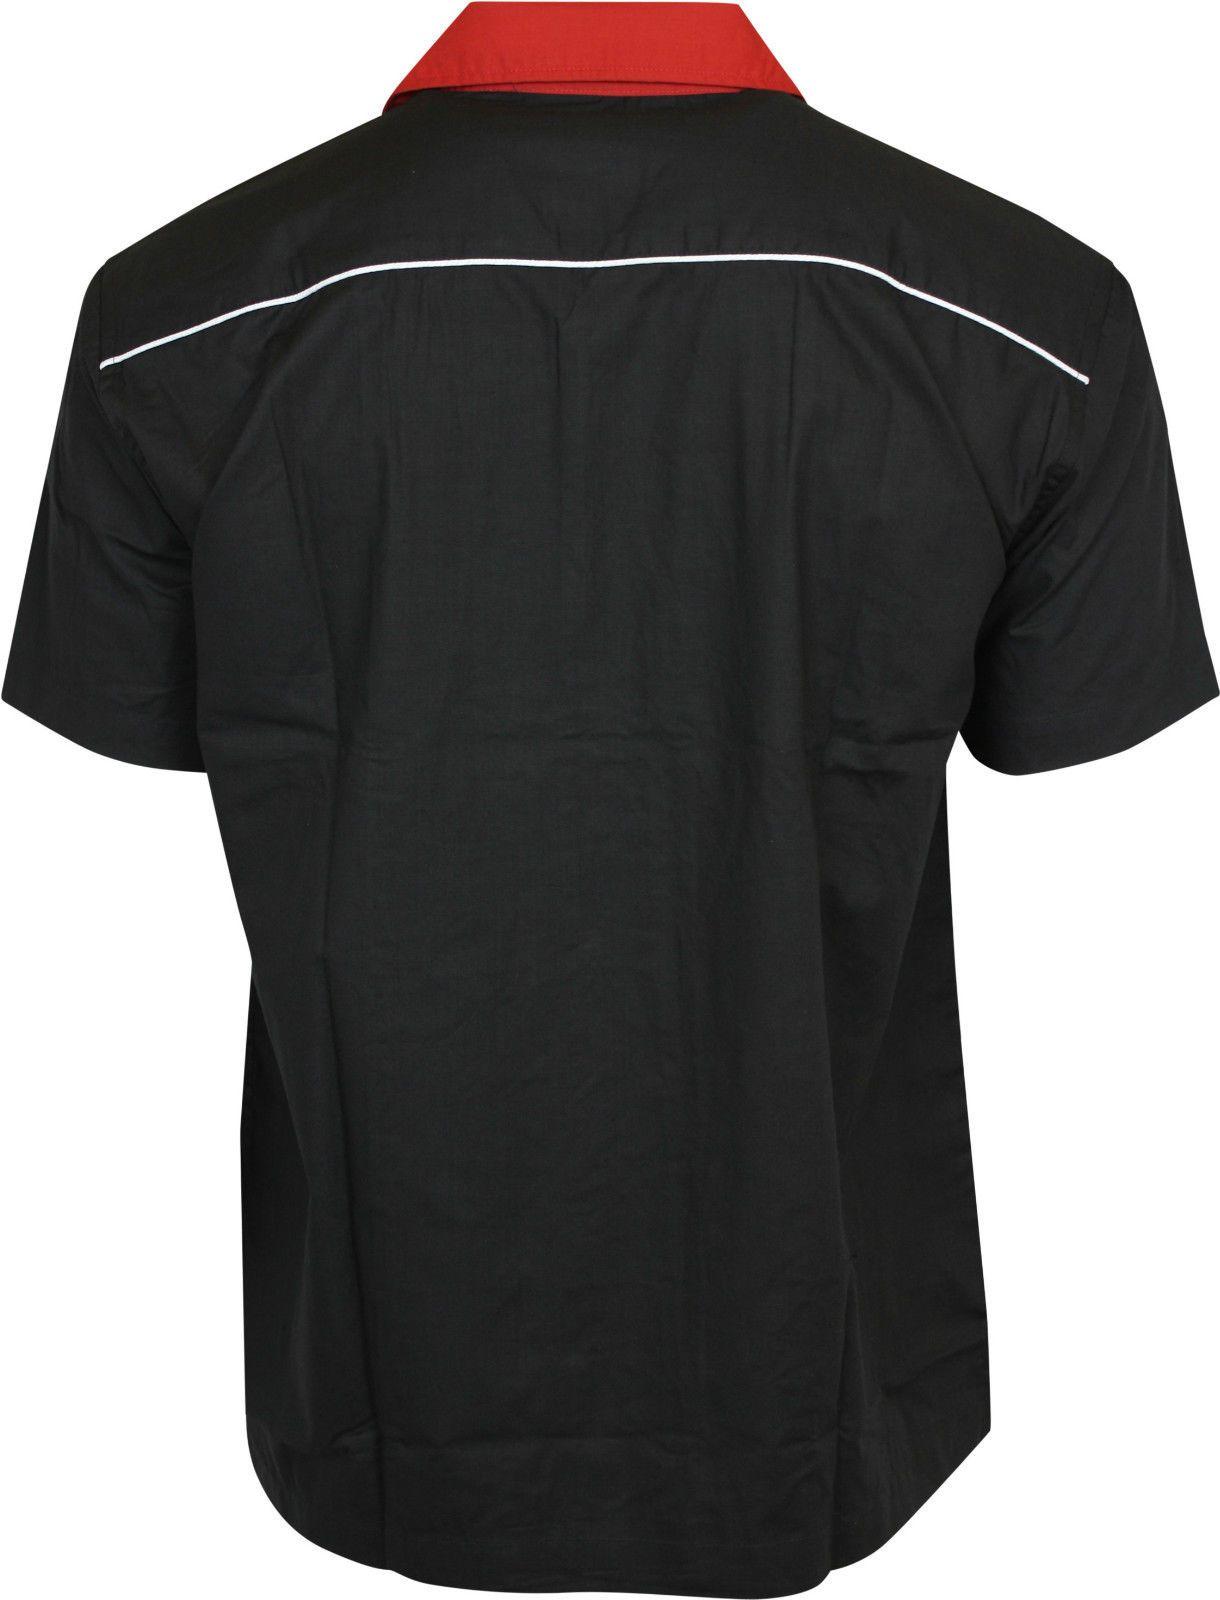 Bowling Shirts Custom Uk Chad Crowley Productions